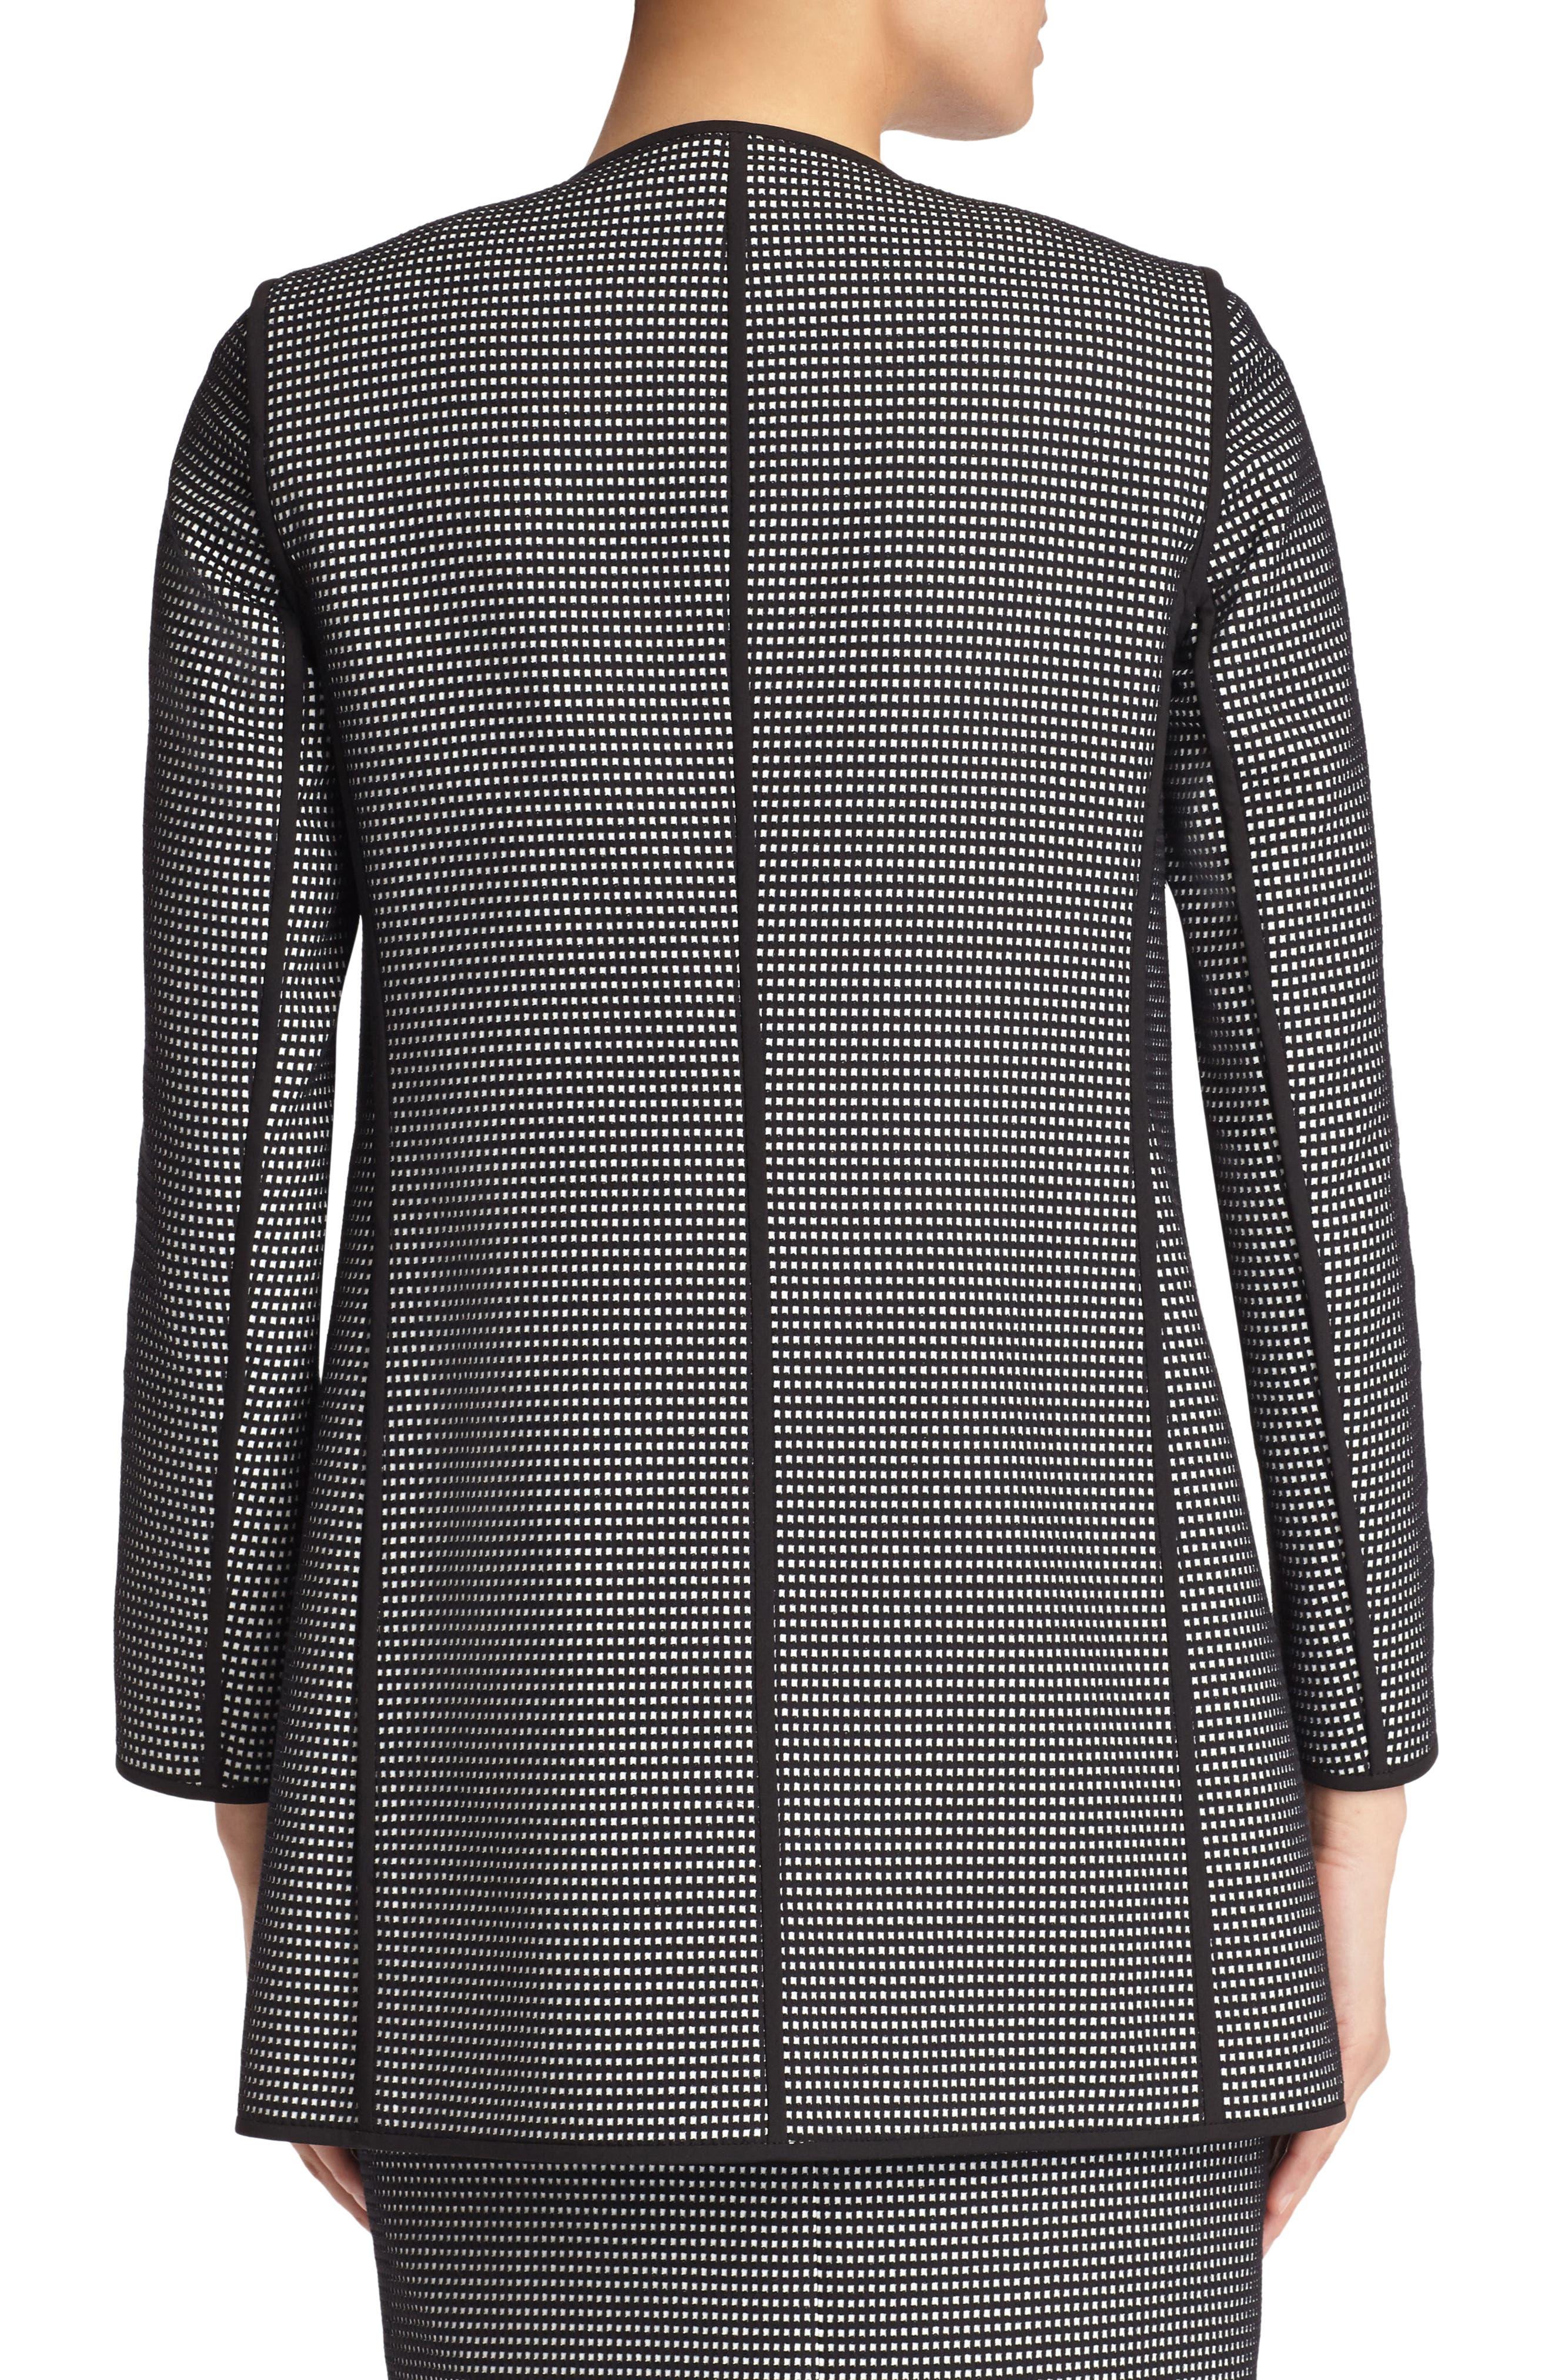 Pria Check Jacket,                             Alternate thumbnail 2, color,                             Black Multi